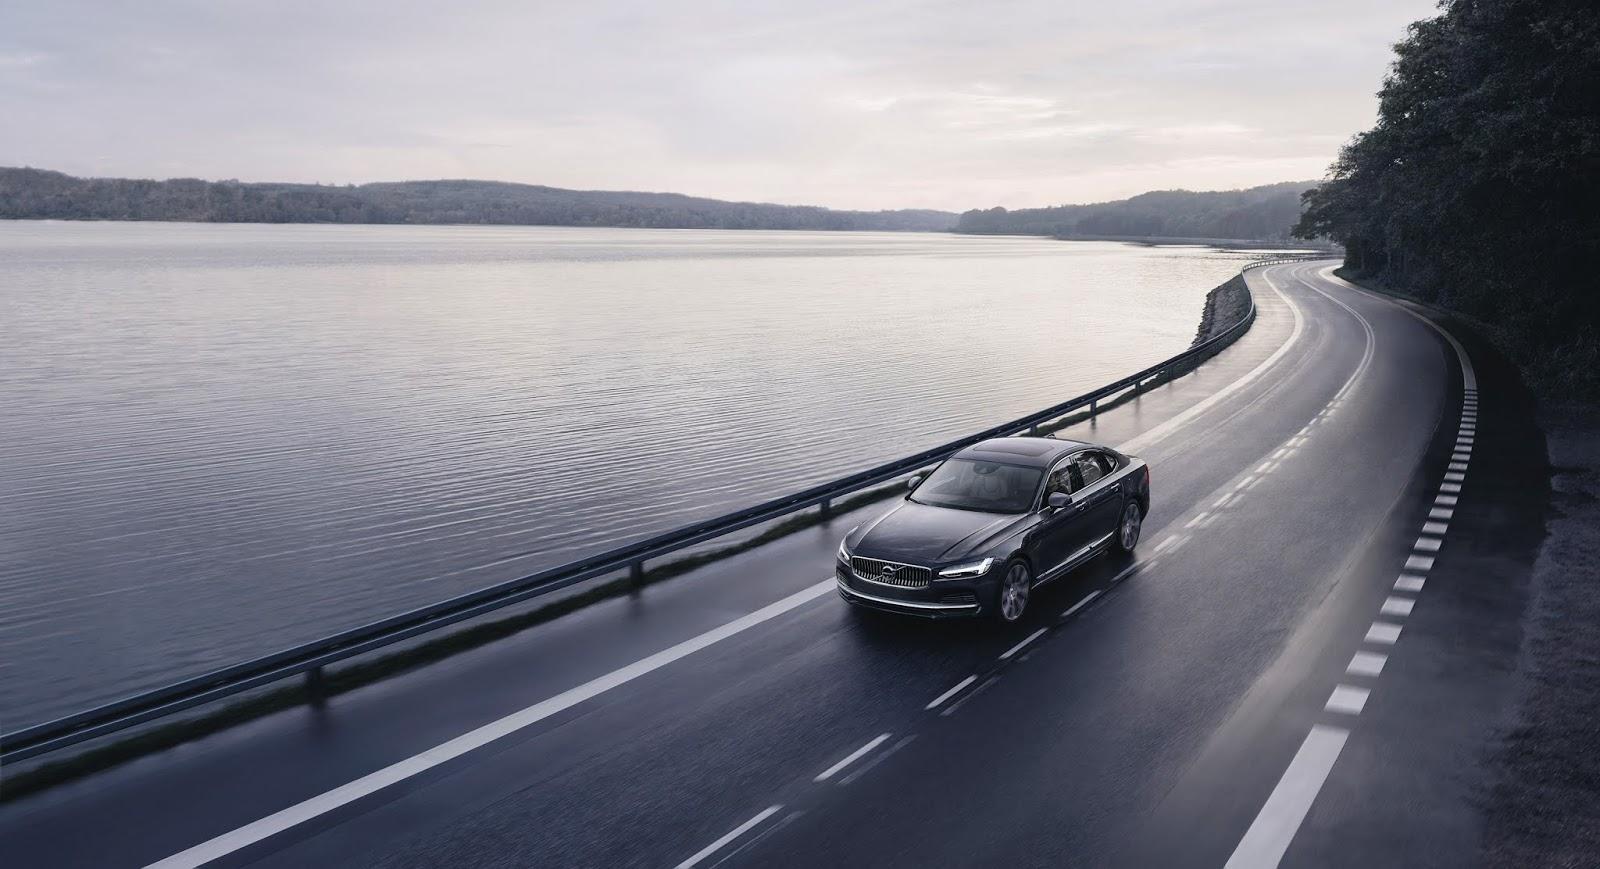 262602 The refreshed Volvo S90 Recharge T8 plug in hybrid in Platinum Grey Πλέον, όλα τα Volvo έχουν τελική 180 χ.α.ω. Volvo, Volvo Car Hellas, Volvo Cars, επιδόσεις